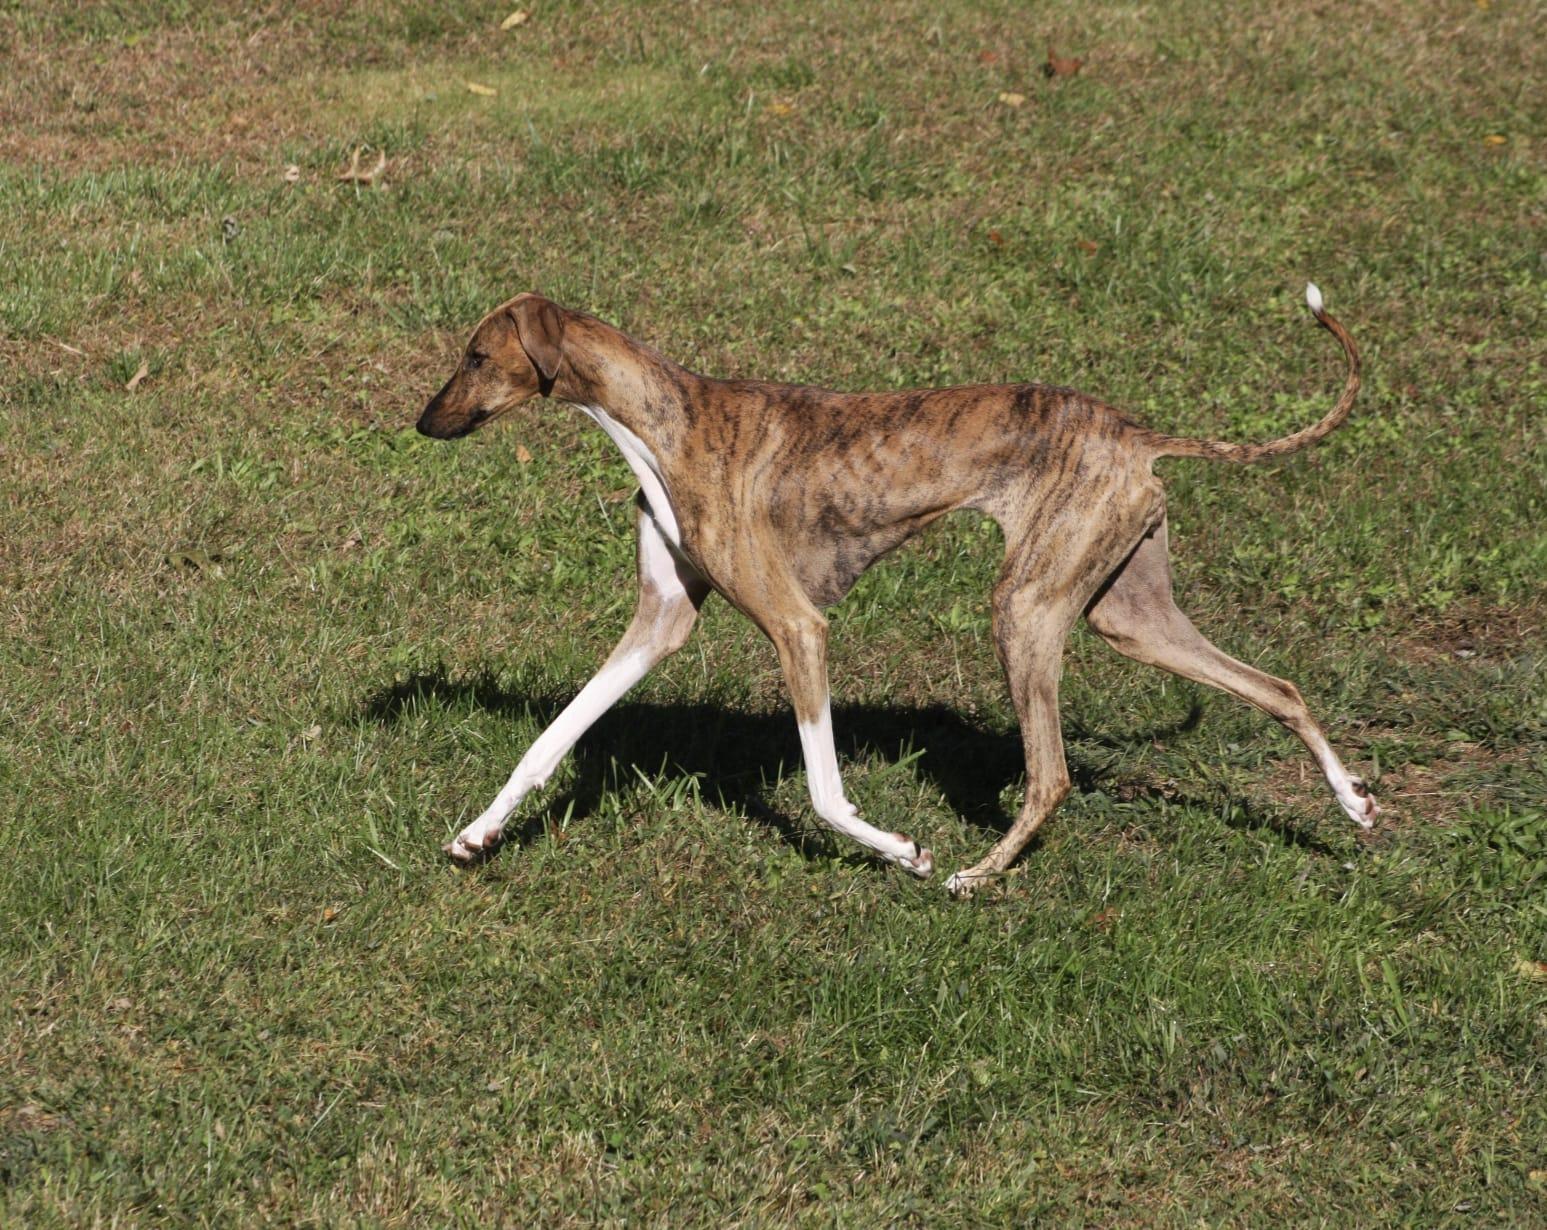 azawakh-dog-history